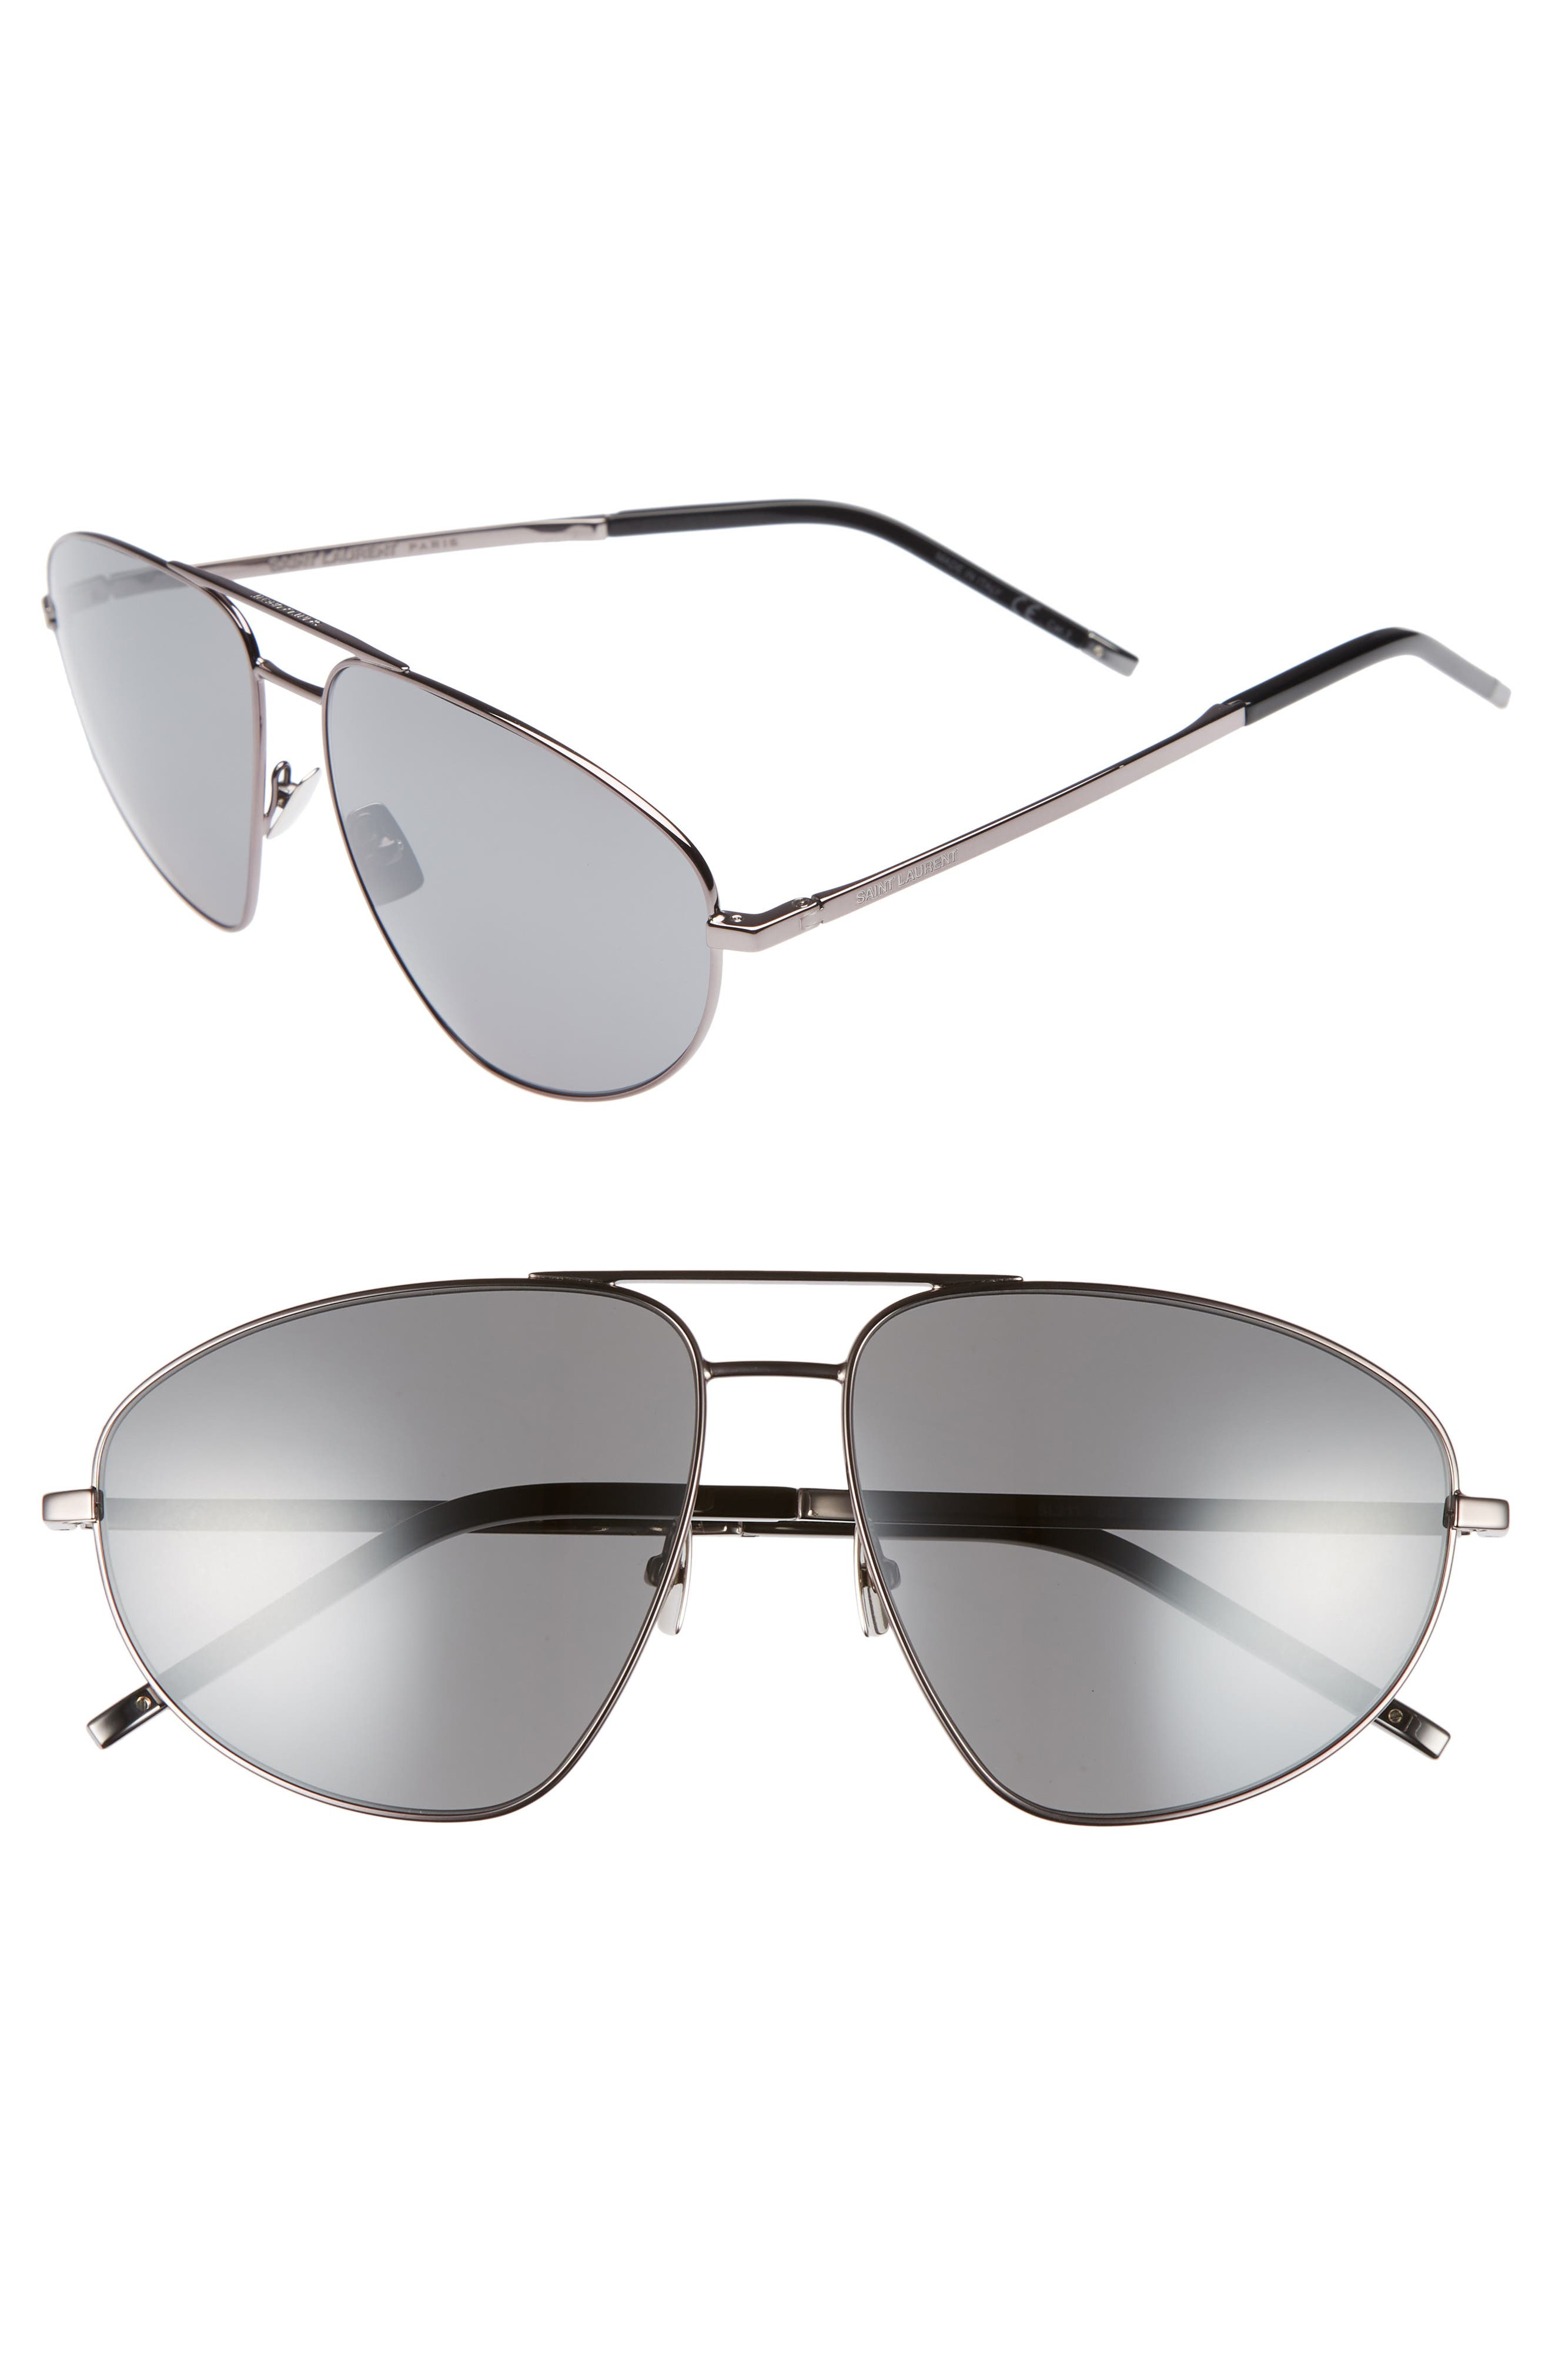 SL 211 60mm Aviator Sunglasses,                         Main,                         color, Dark Ruthenium/ Black